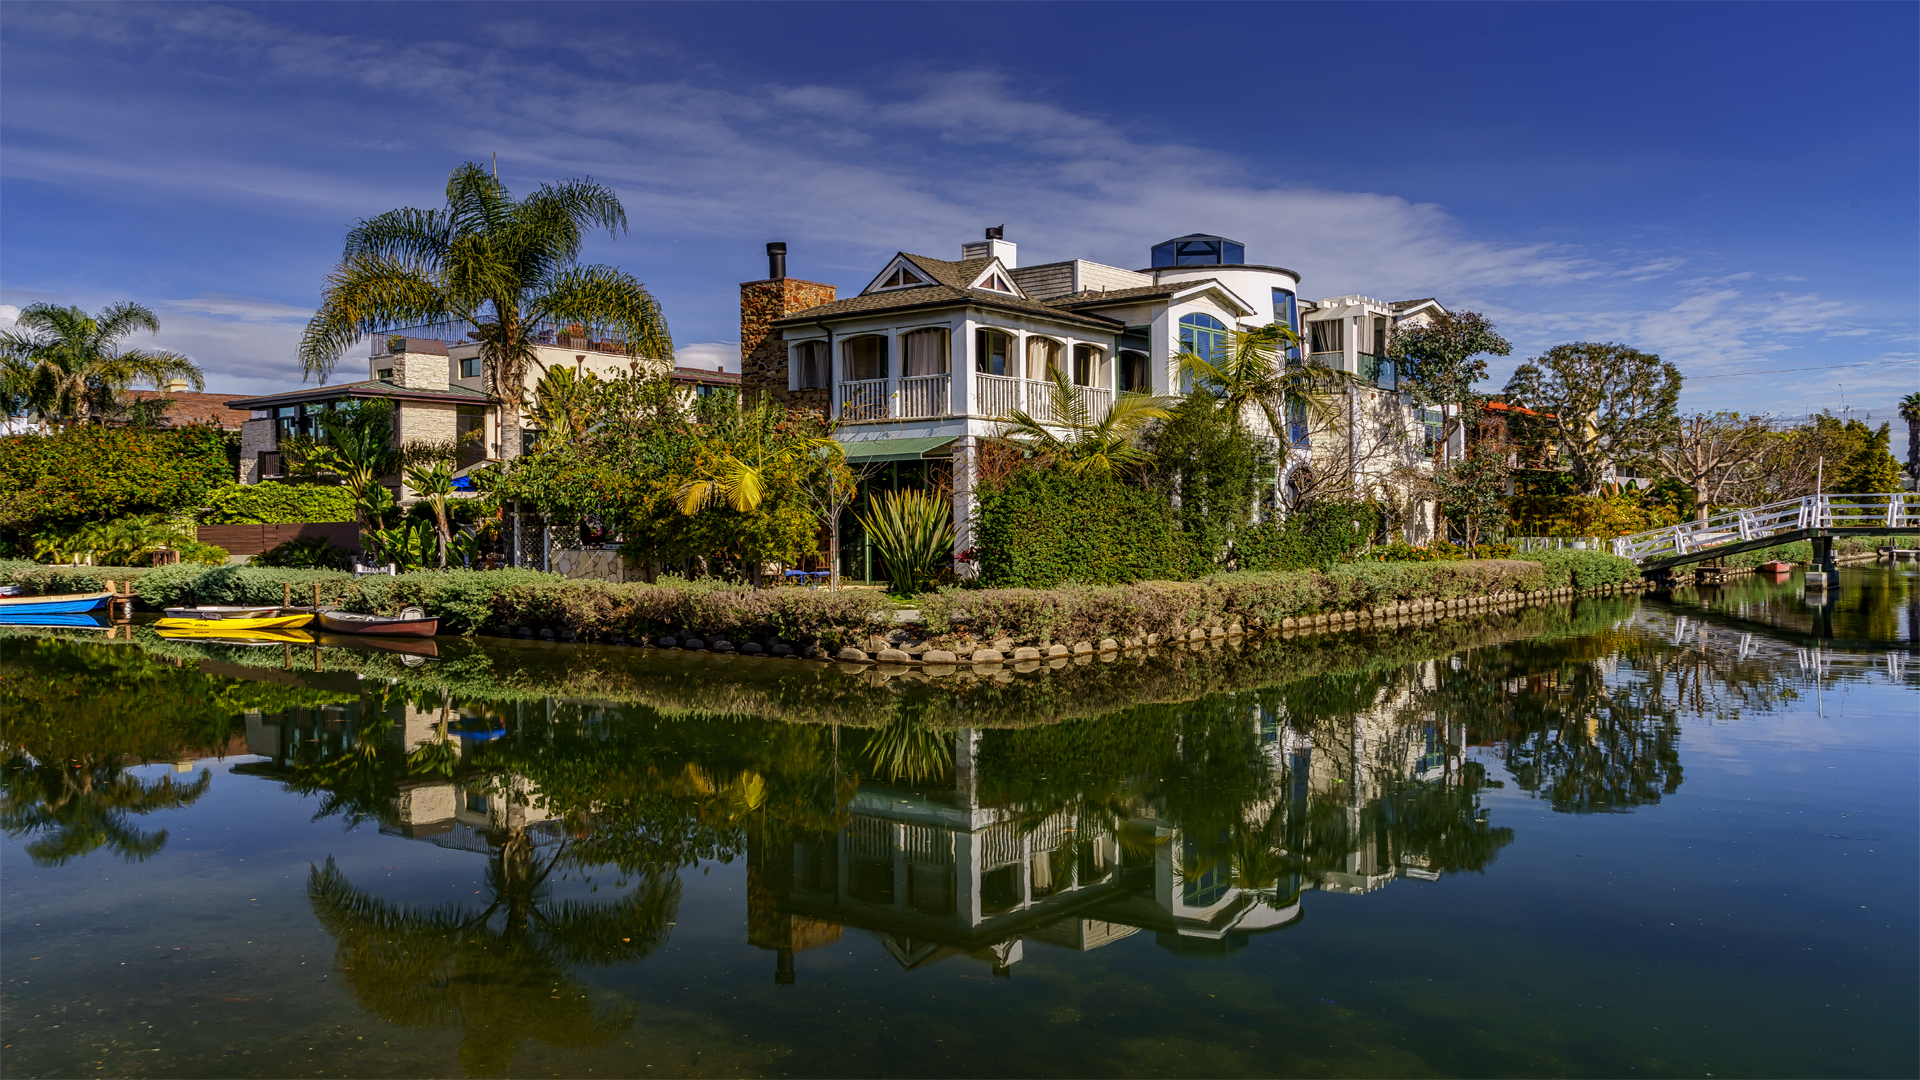 Venice Beach Canals1 2-14-18